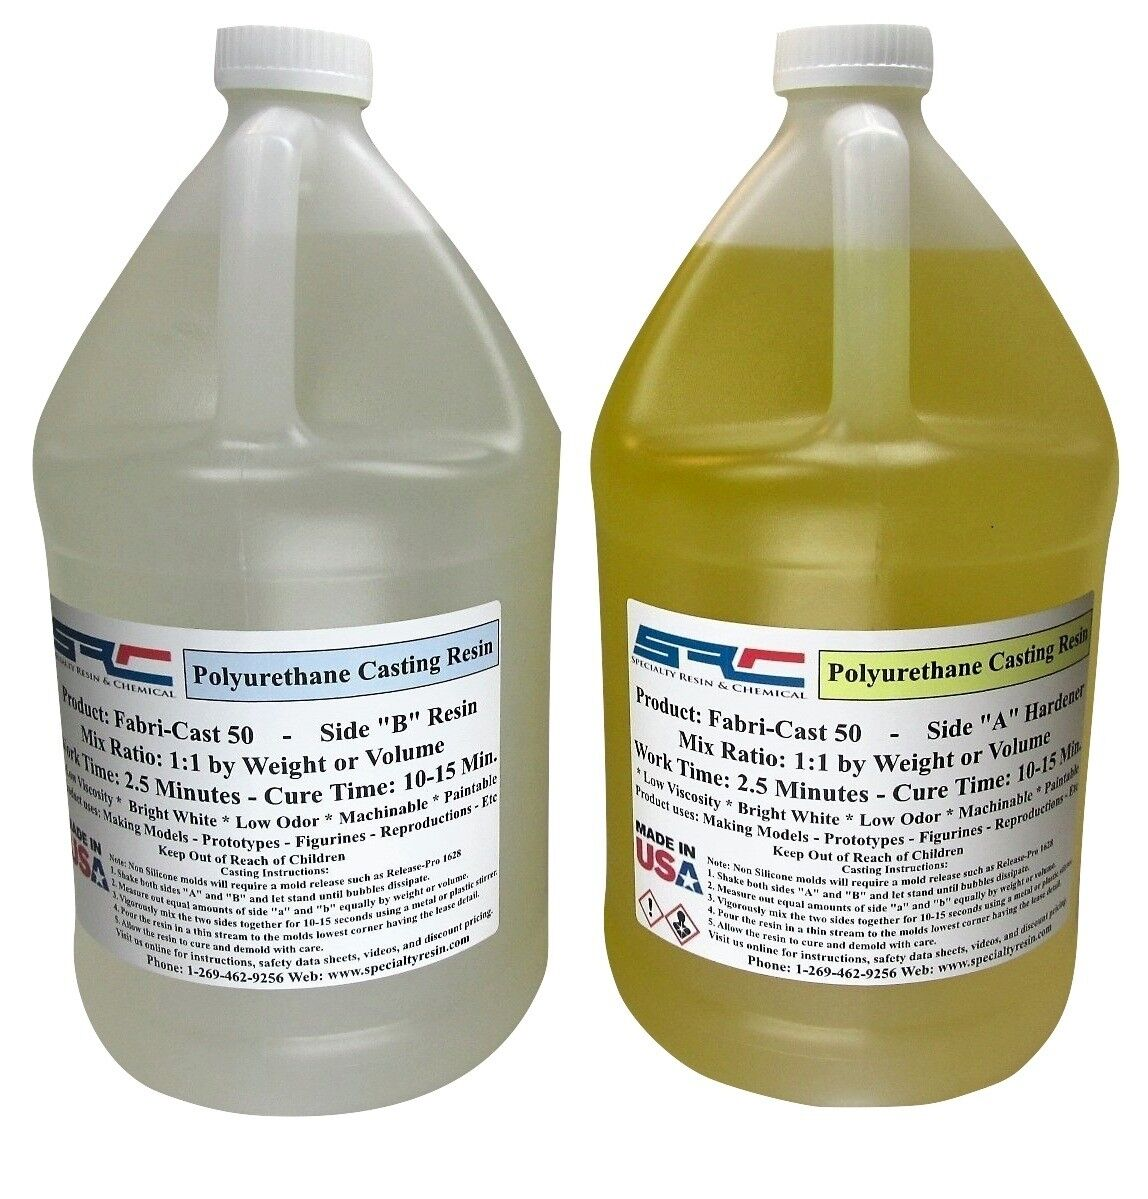 Fabri-Cast 50 Ultra-Low Viscosity Urethane Casting Resin 2 Gallons